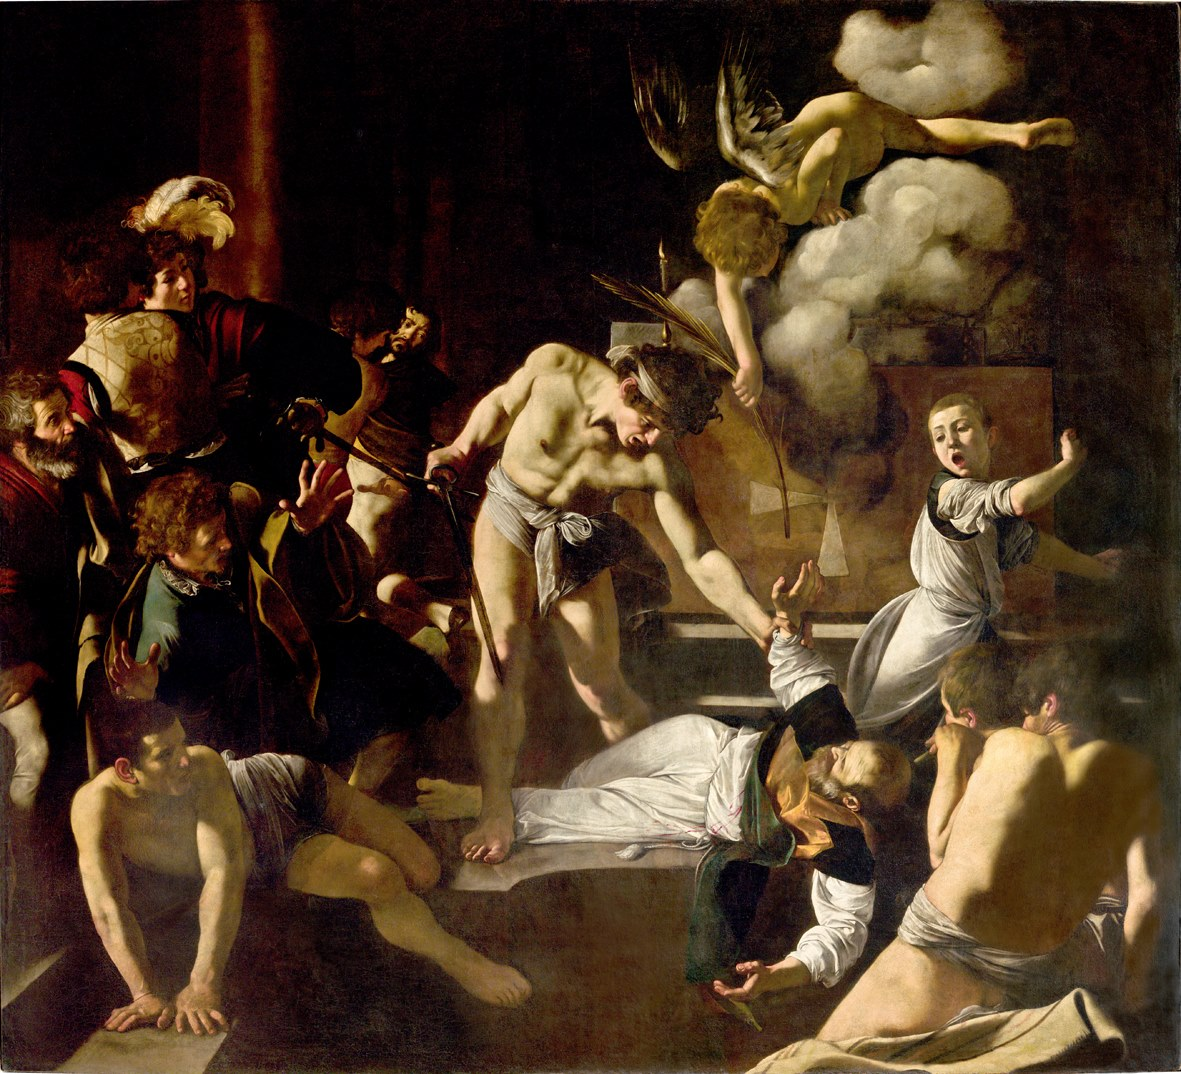 3-caravaggio-martirio-di-san-matteo-chiesa-di-san-luigi-de-francesi